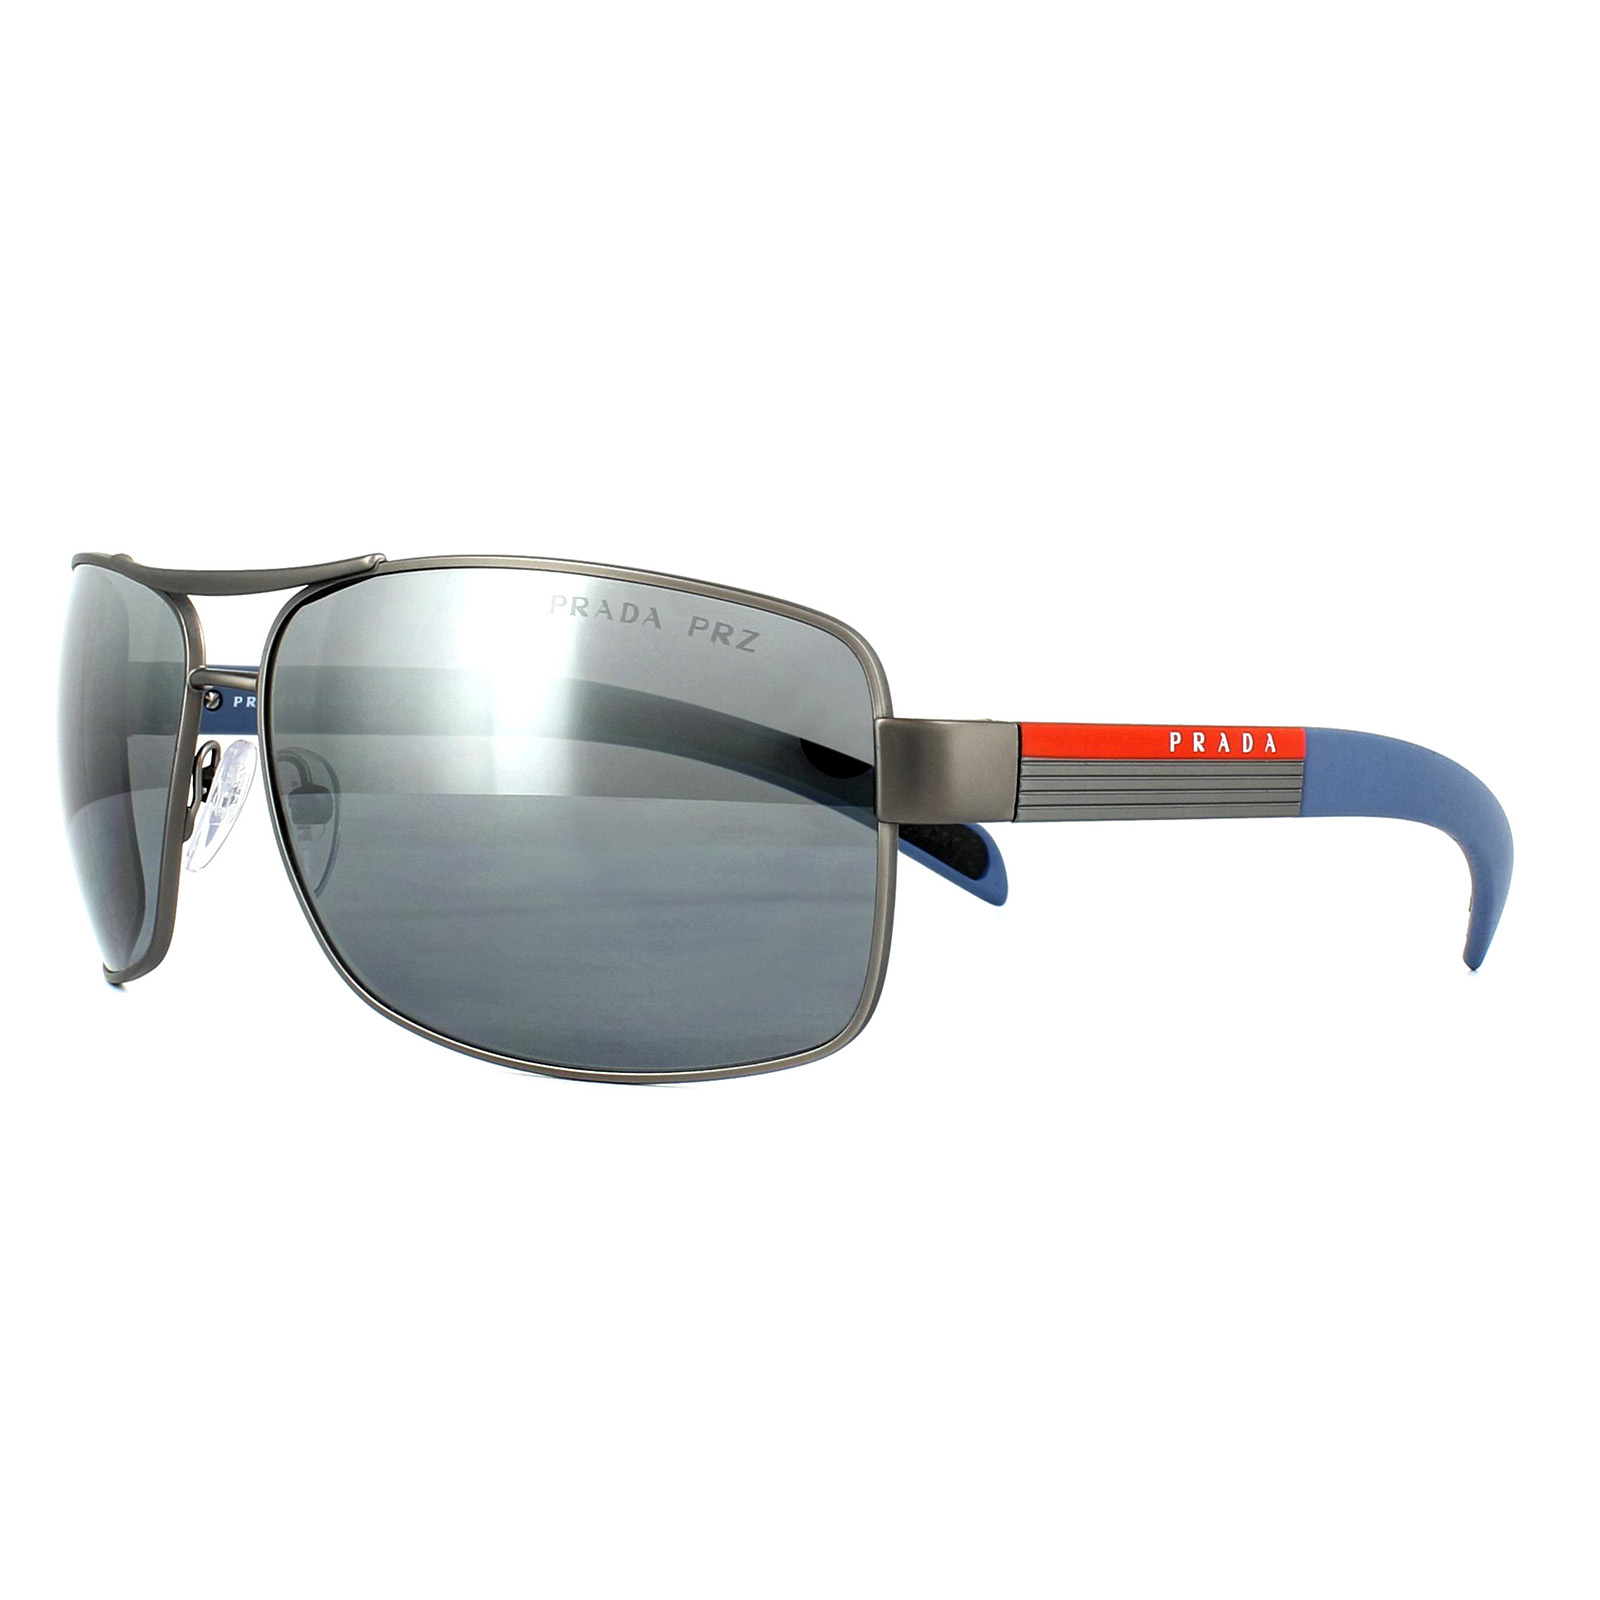 0547b93c3b Sentinel Prada Sport Sunglasses 54IS DG12F2 Gunmetal Rubber Silver Mirror  Polarized